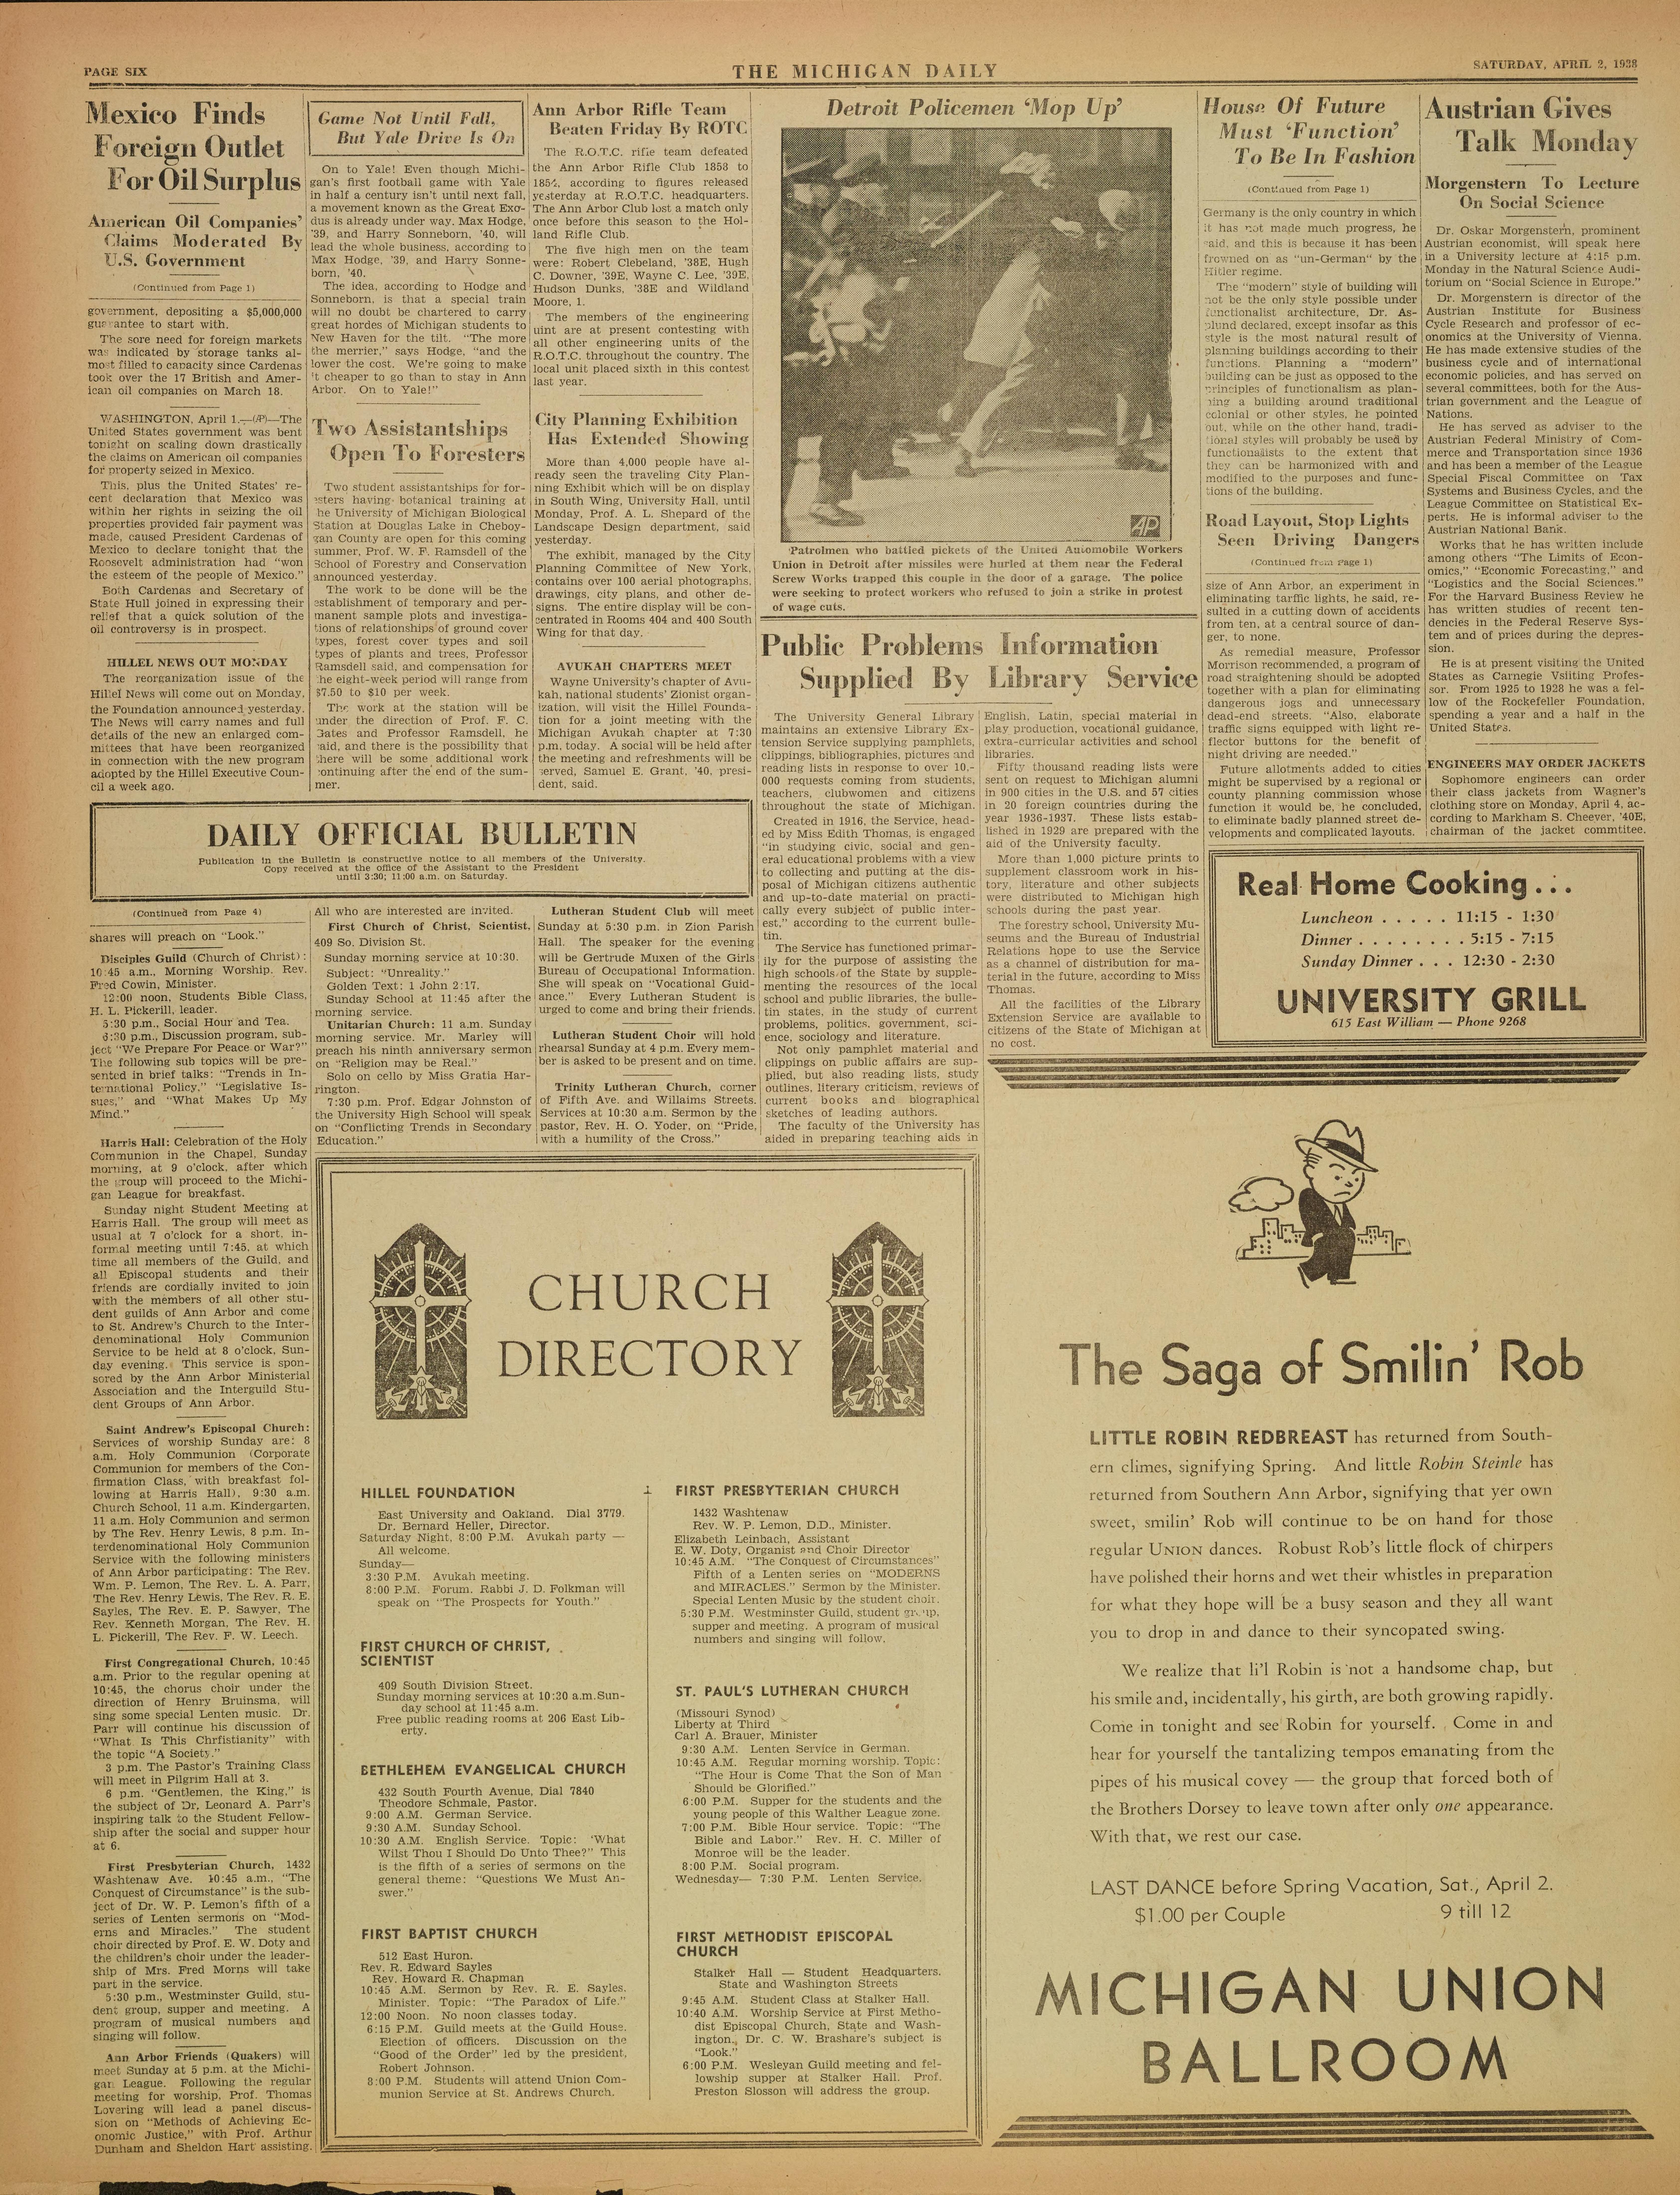 Michigan Daily Digital Archives - April 02, 1938 (vol  48, iss  134